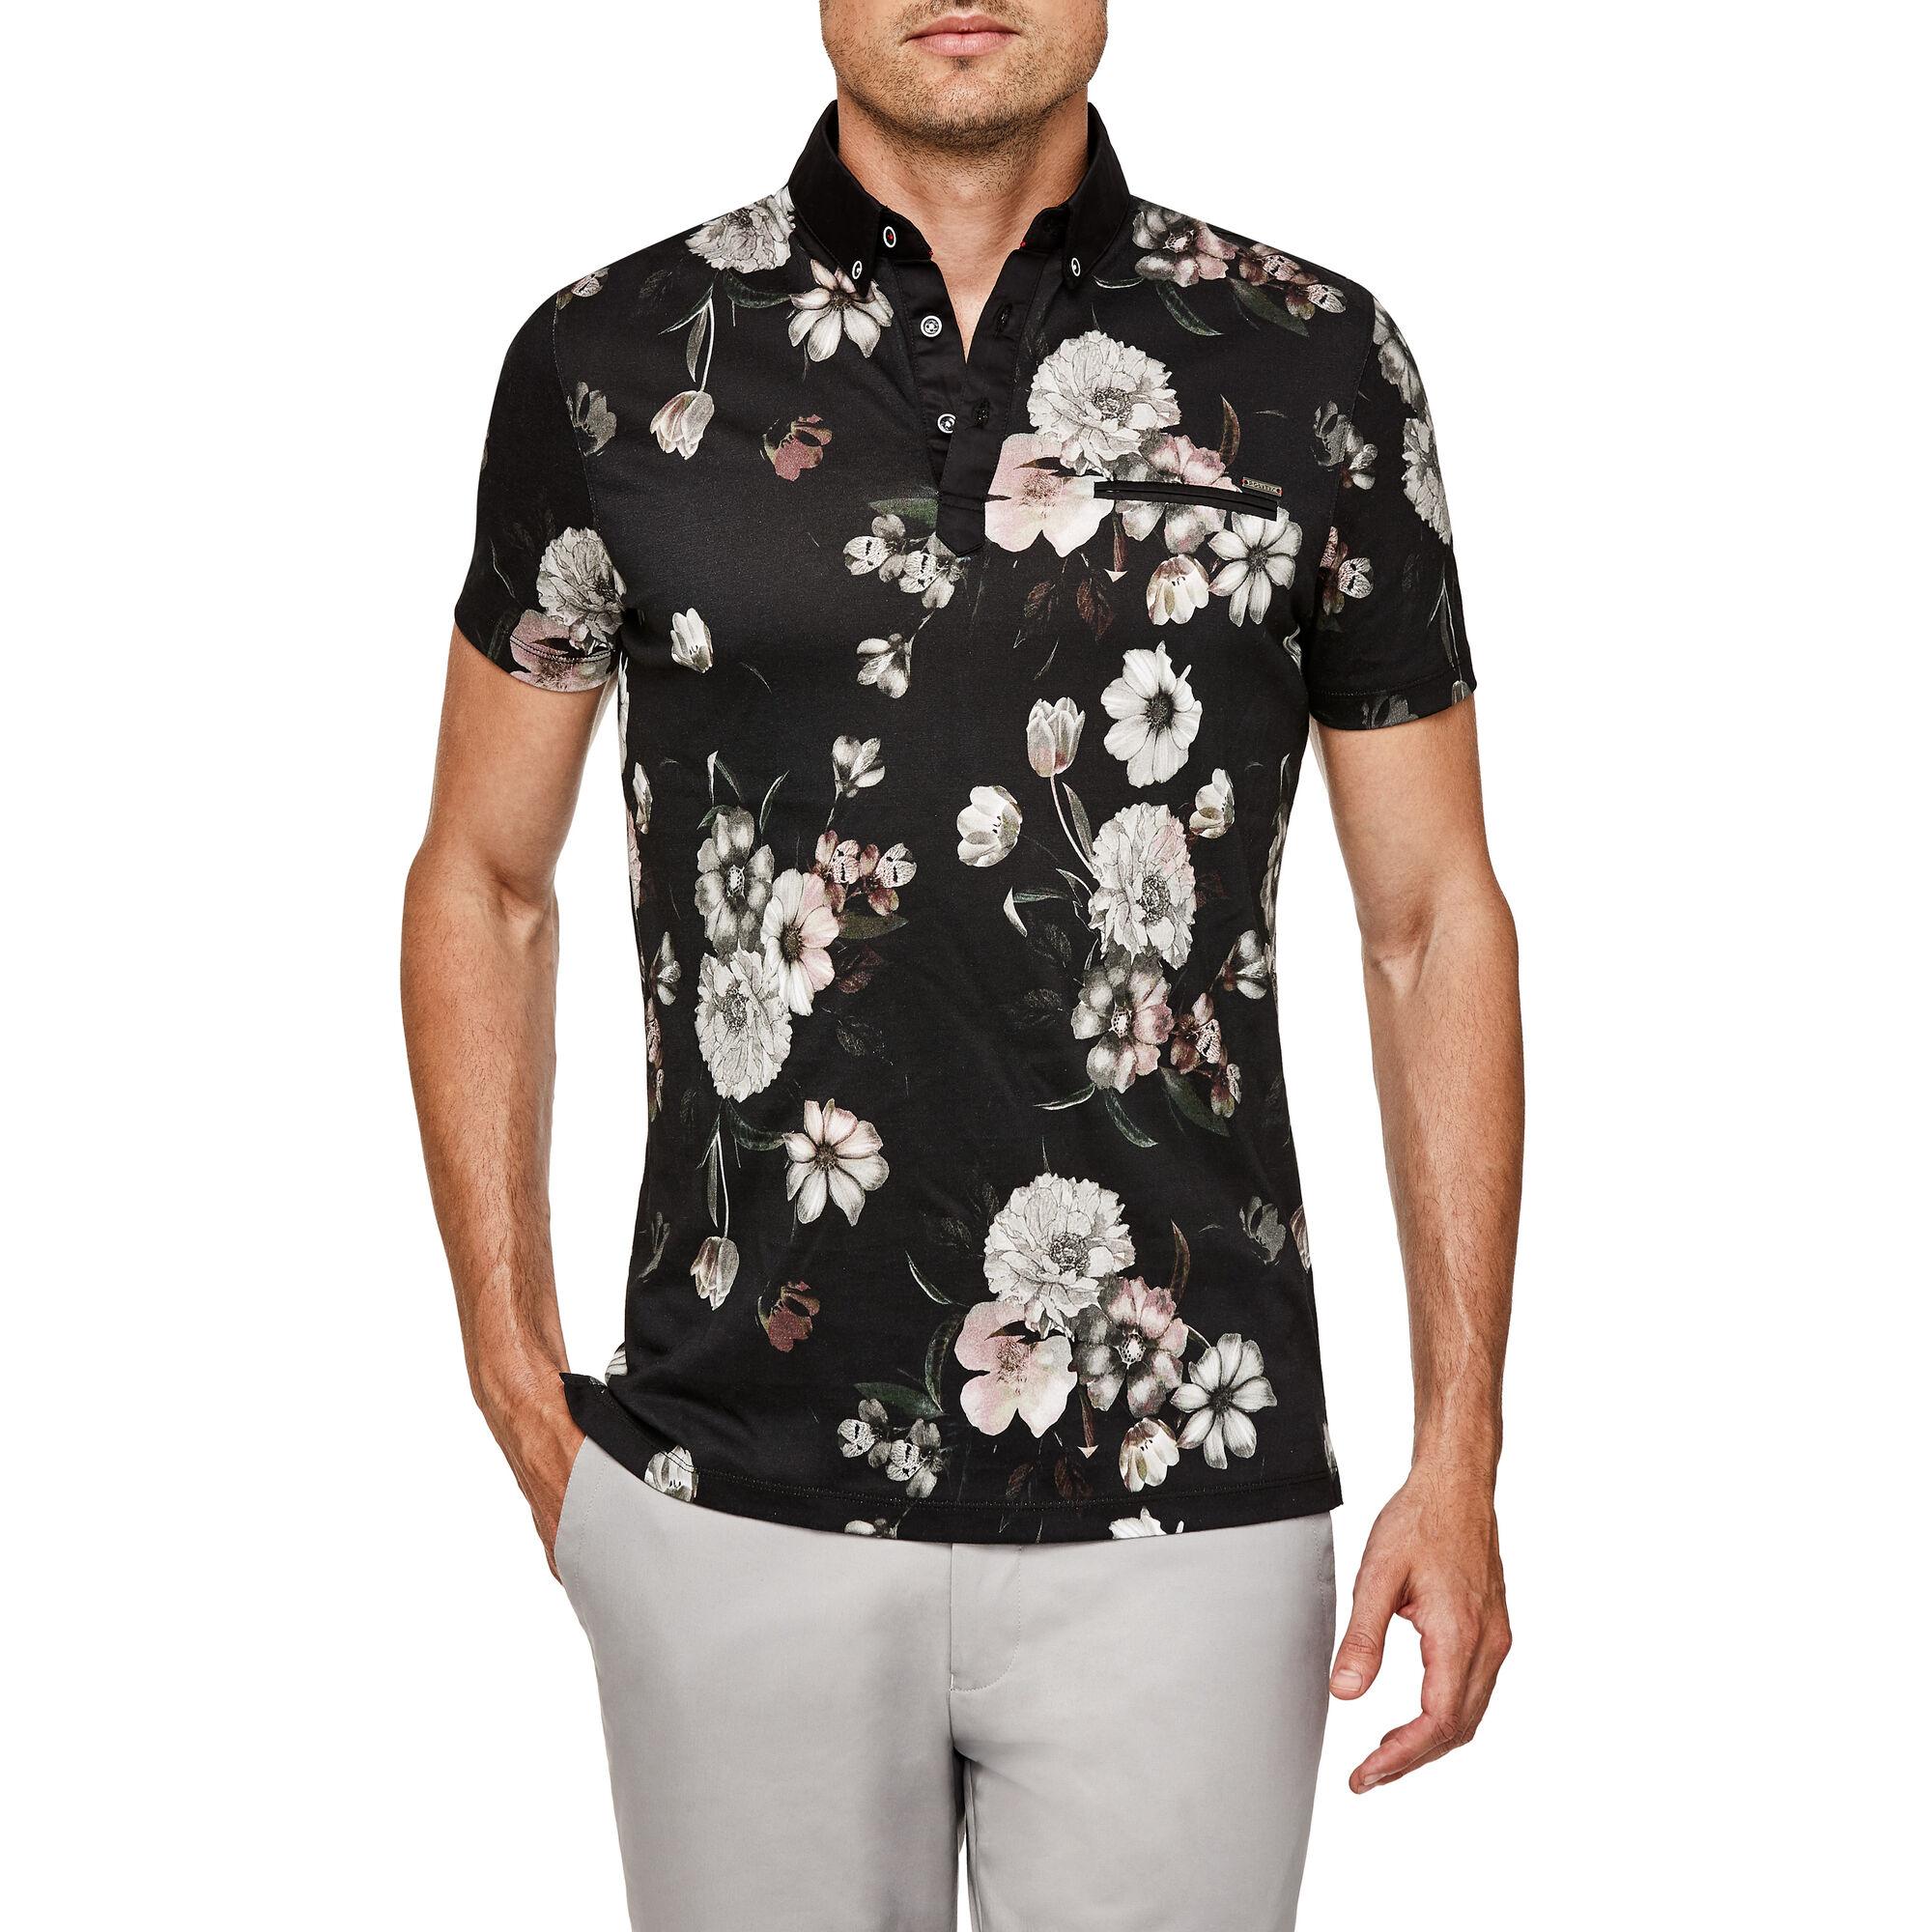 948ce067ab Alann - Navy Floral - Slim Cotton Floral Print Polo Shirt | Politix